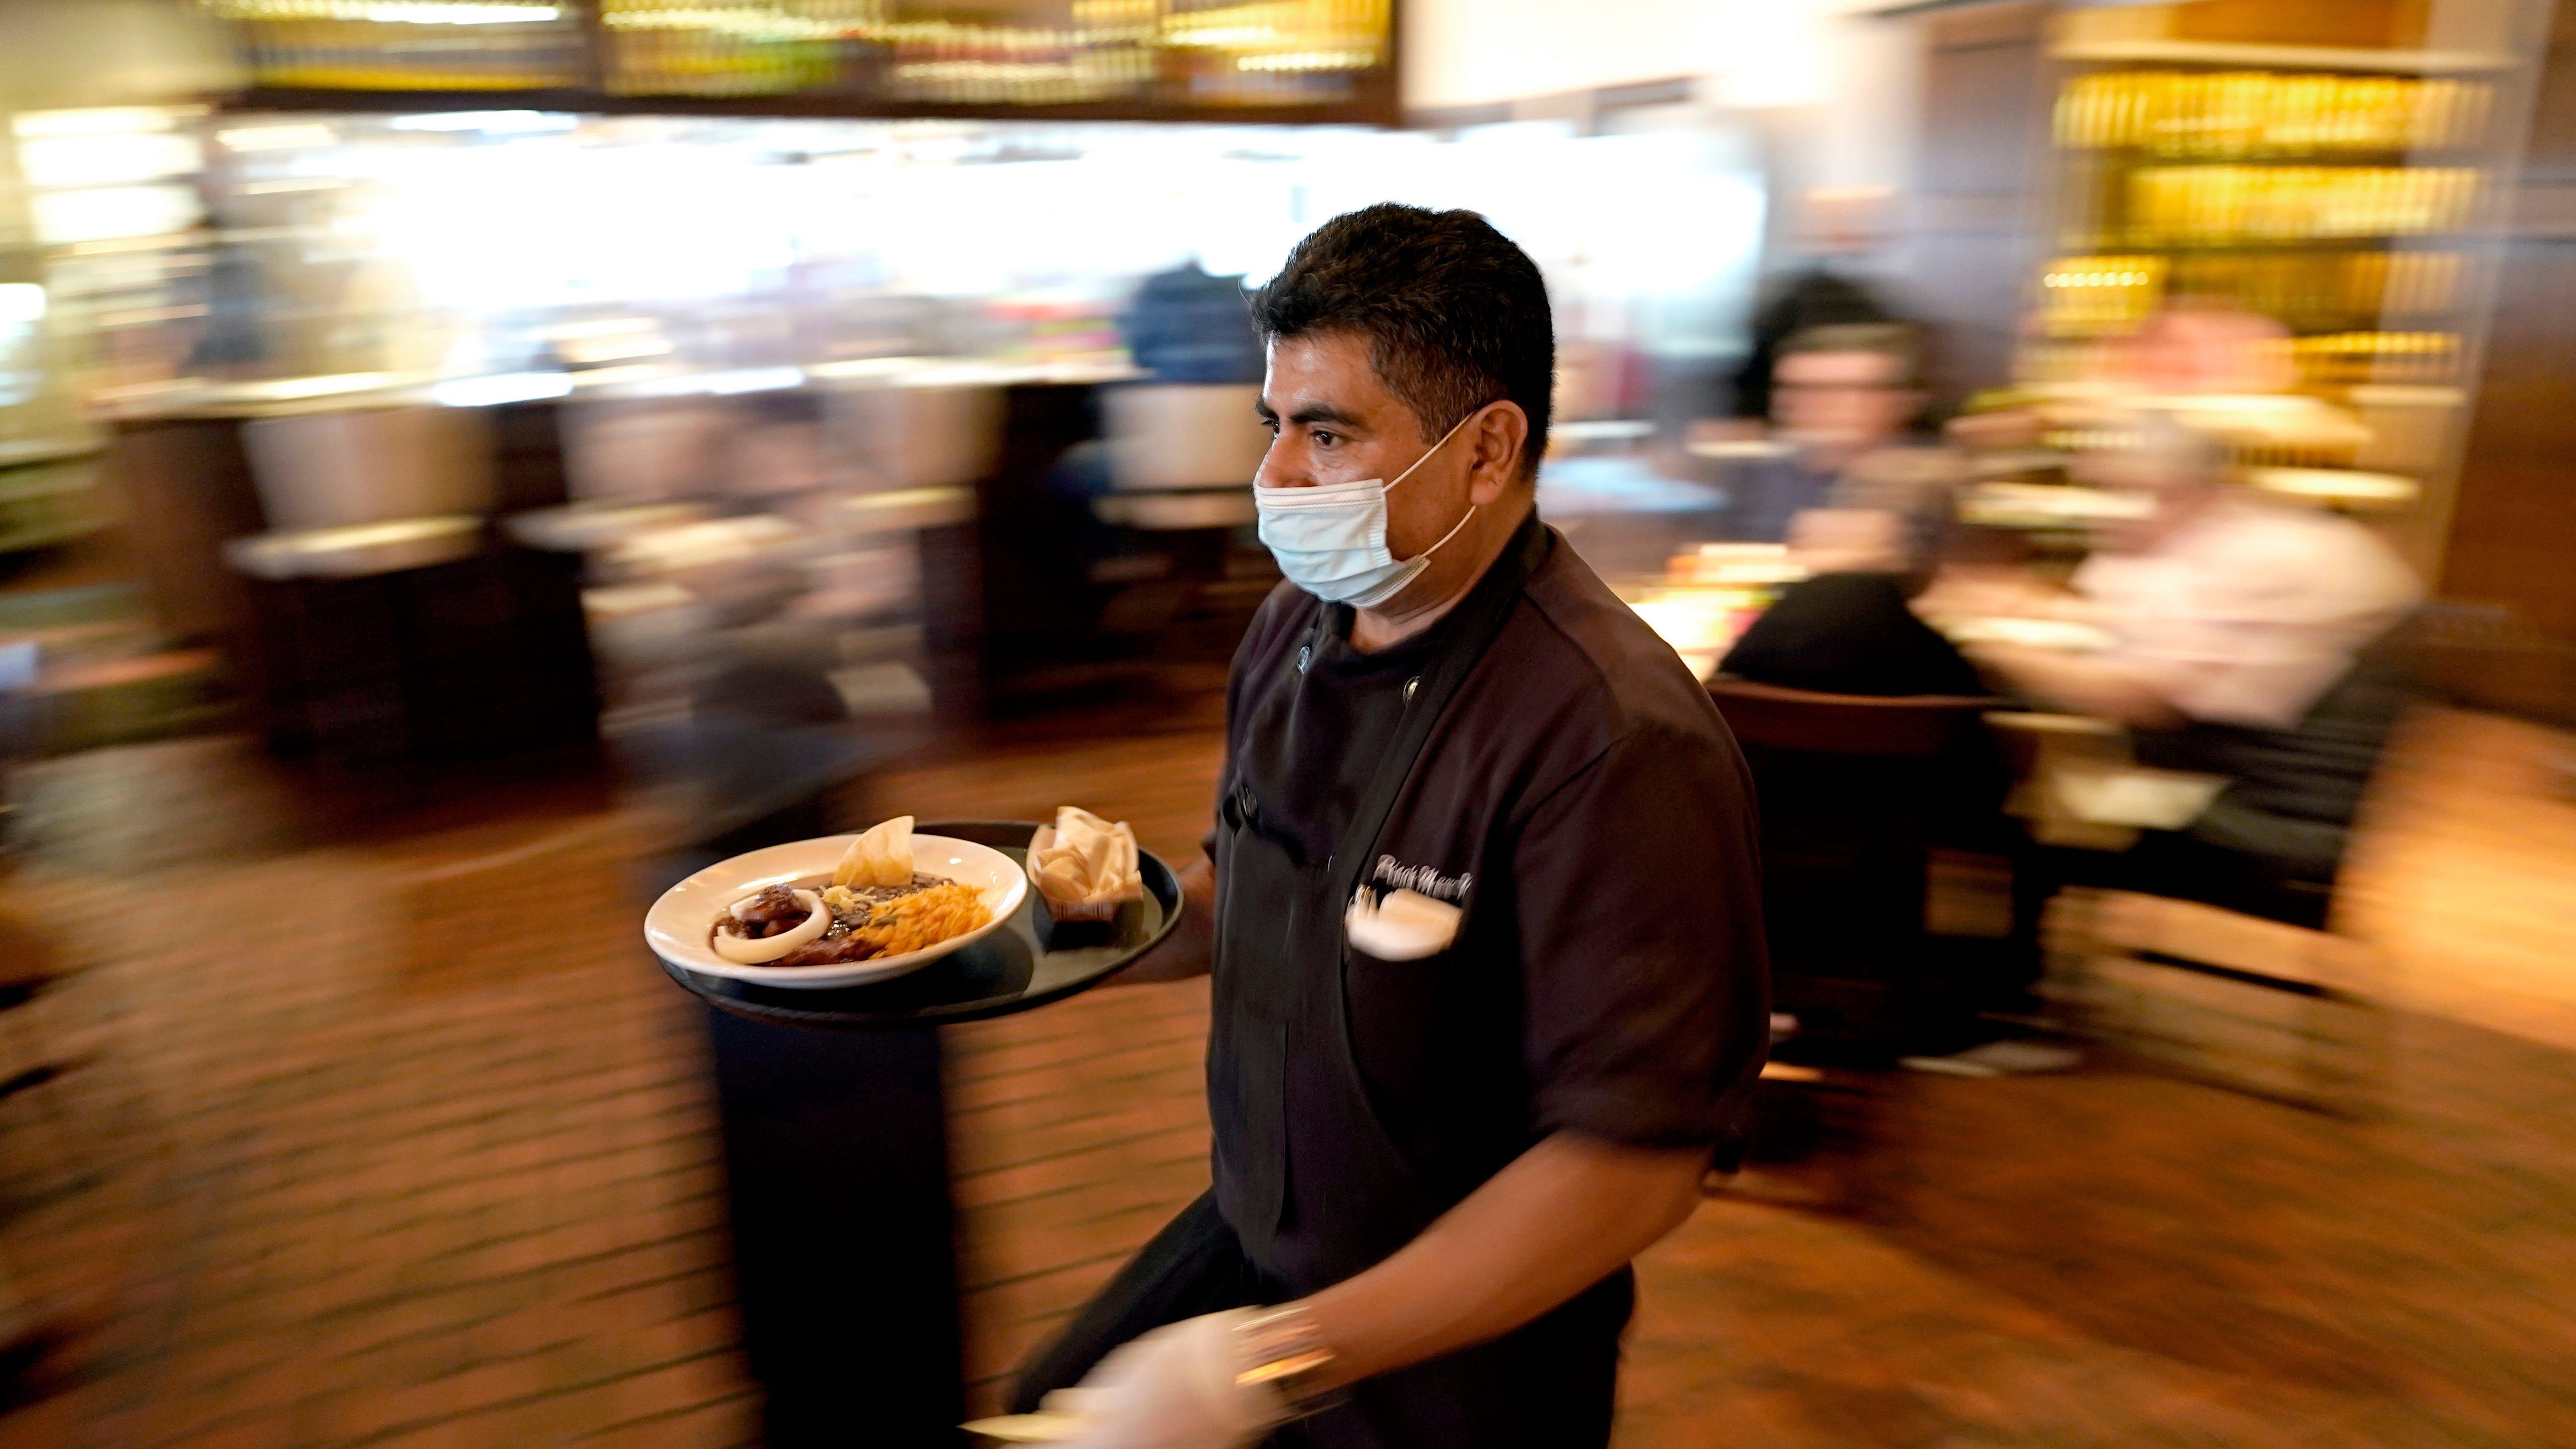 Half of US workers favor employee shot mandate: AP-NORC poll